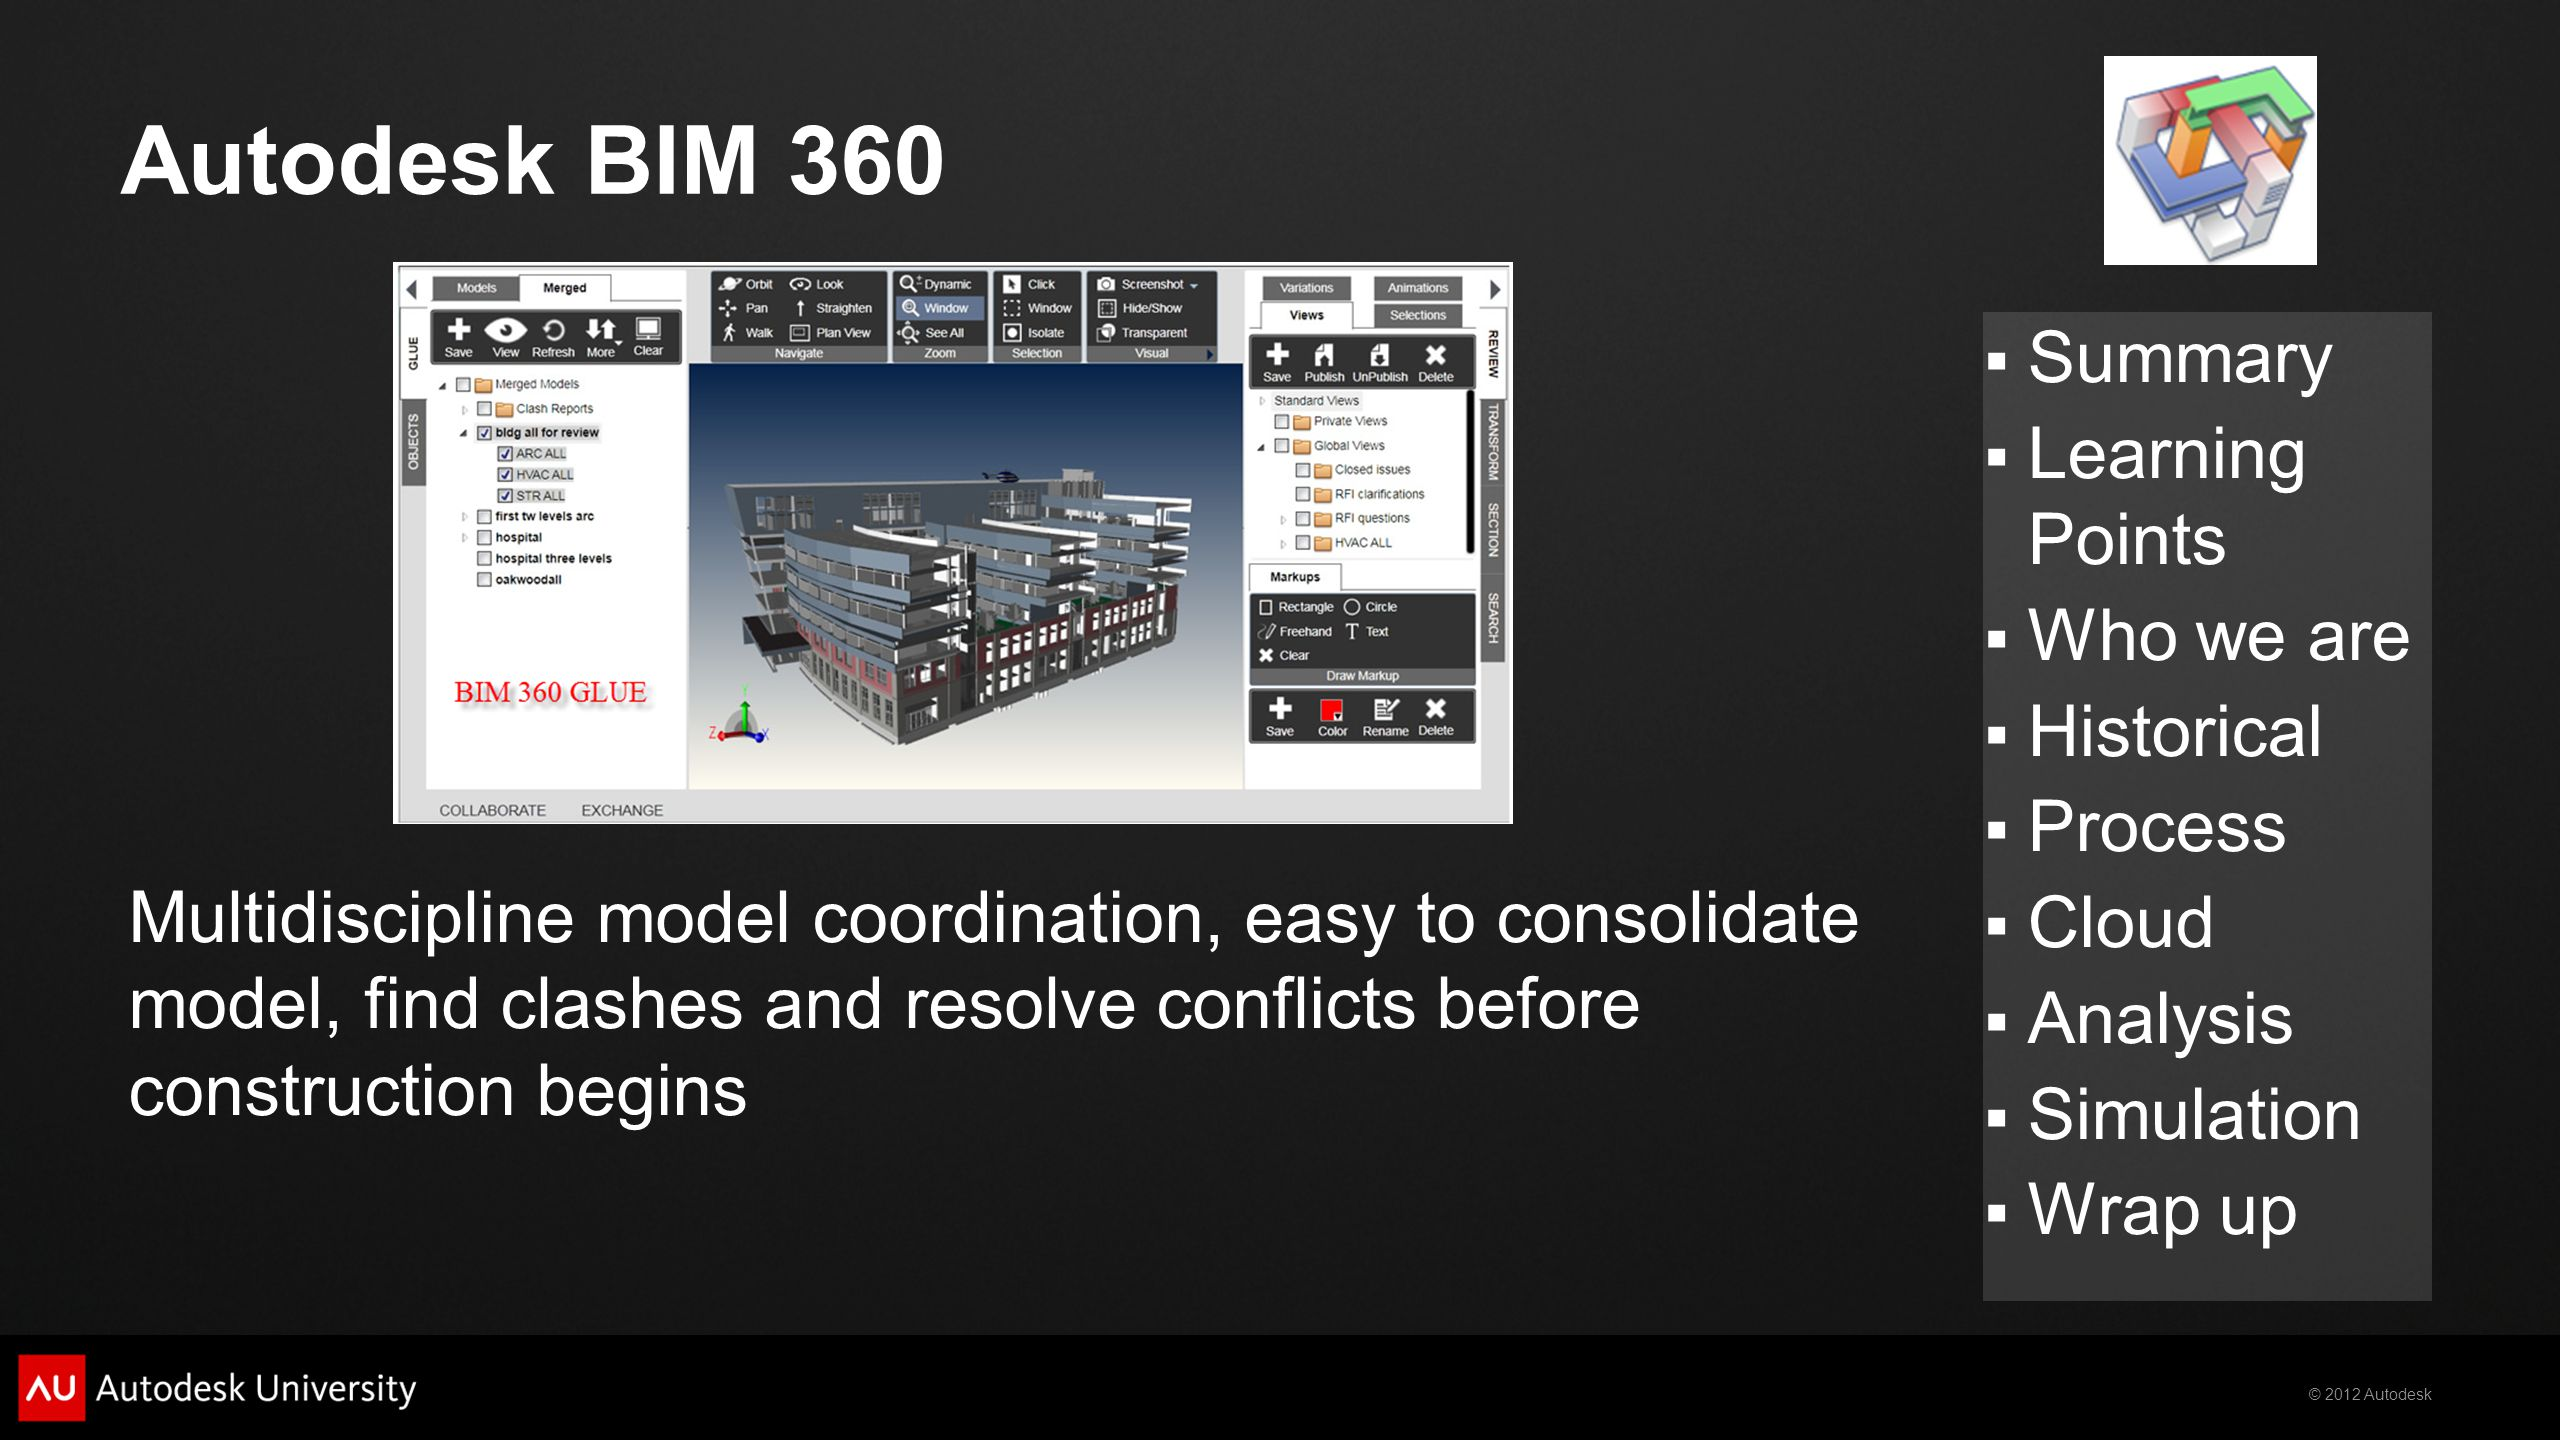 © 2012 Autodesk  Summary  Learning Points  Who we are  Historical  Process  Cloud  Analysis  Simulation  Wrap up Autodesk BIM 360 Multidiscip